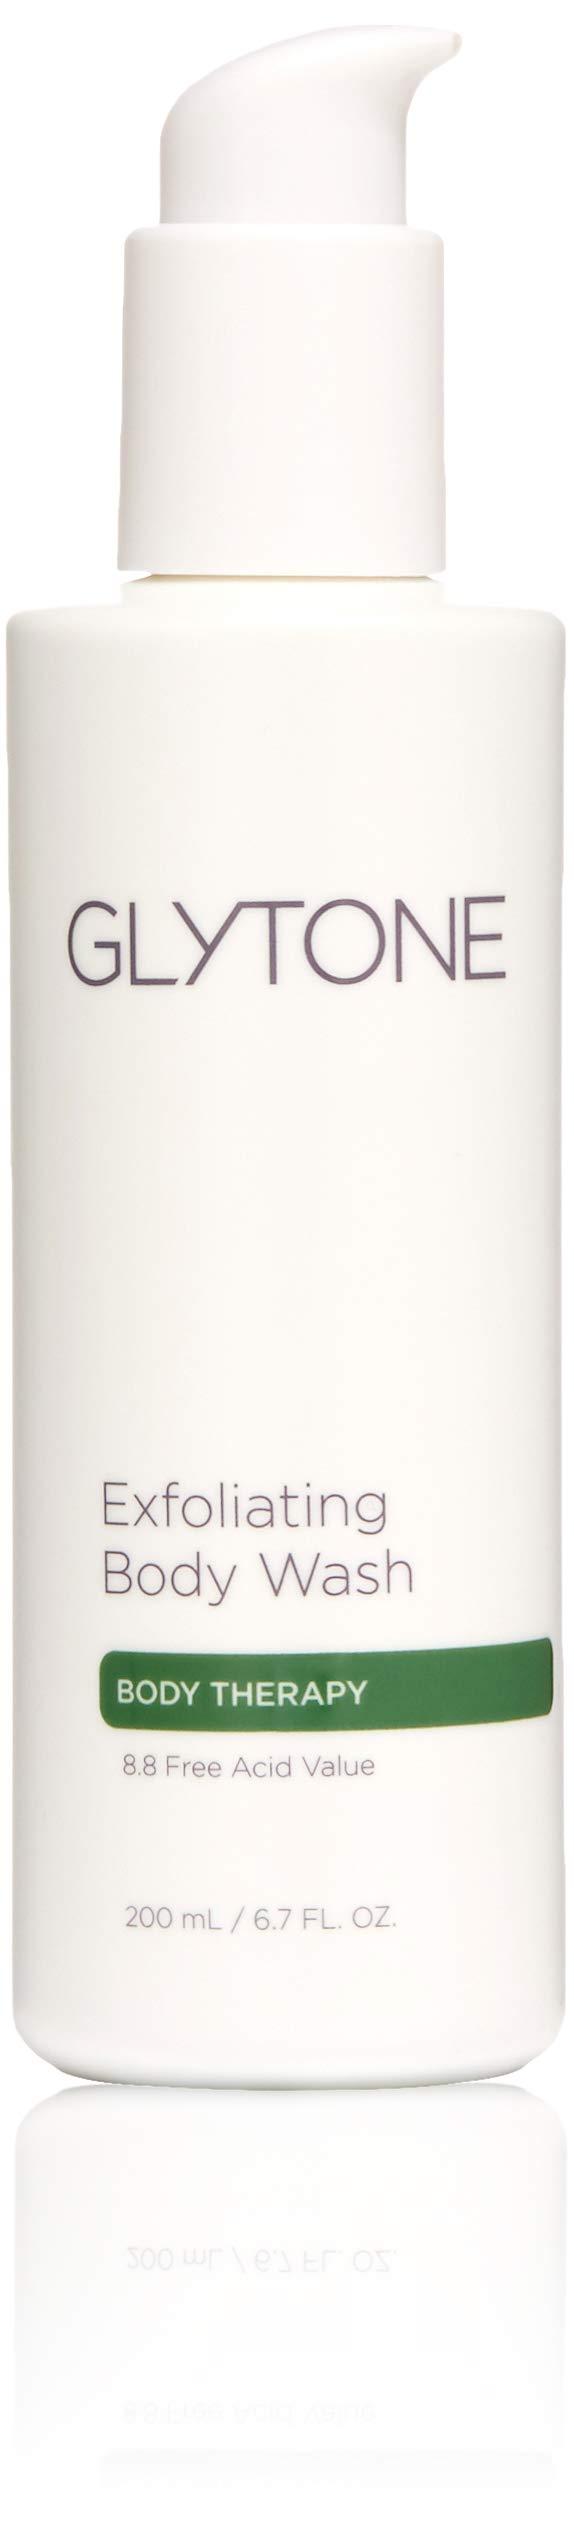 Glytone Exfoliating Body Wash with Glycolic Acid, Keratosis Pilaris, KP, Smooth Rough & Bumpy Skin, Chicken Skin, Oil-Free, Fragrance-Free 6.7 oz.